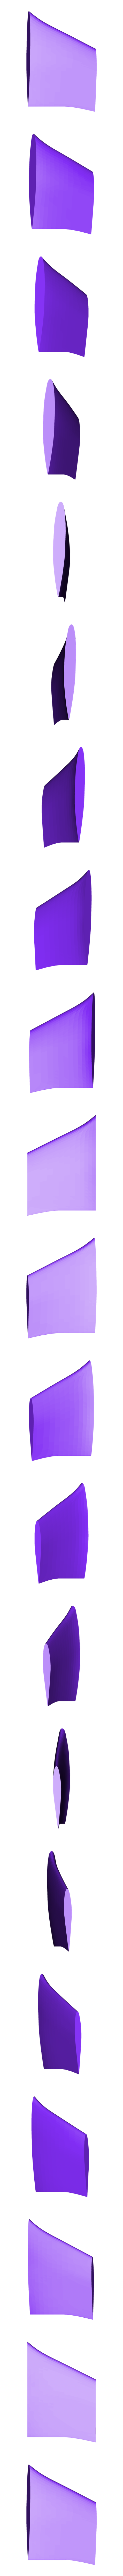 Wing1_R.STL Download STL file Phenom 300 • Template to 3D print, Eduardohbm